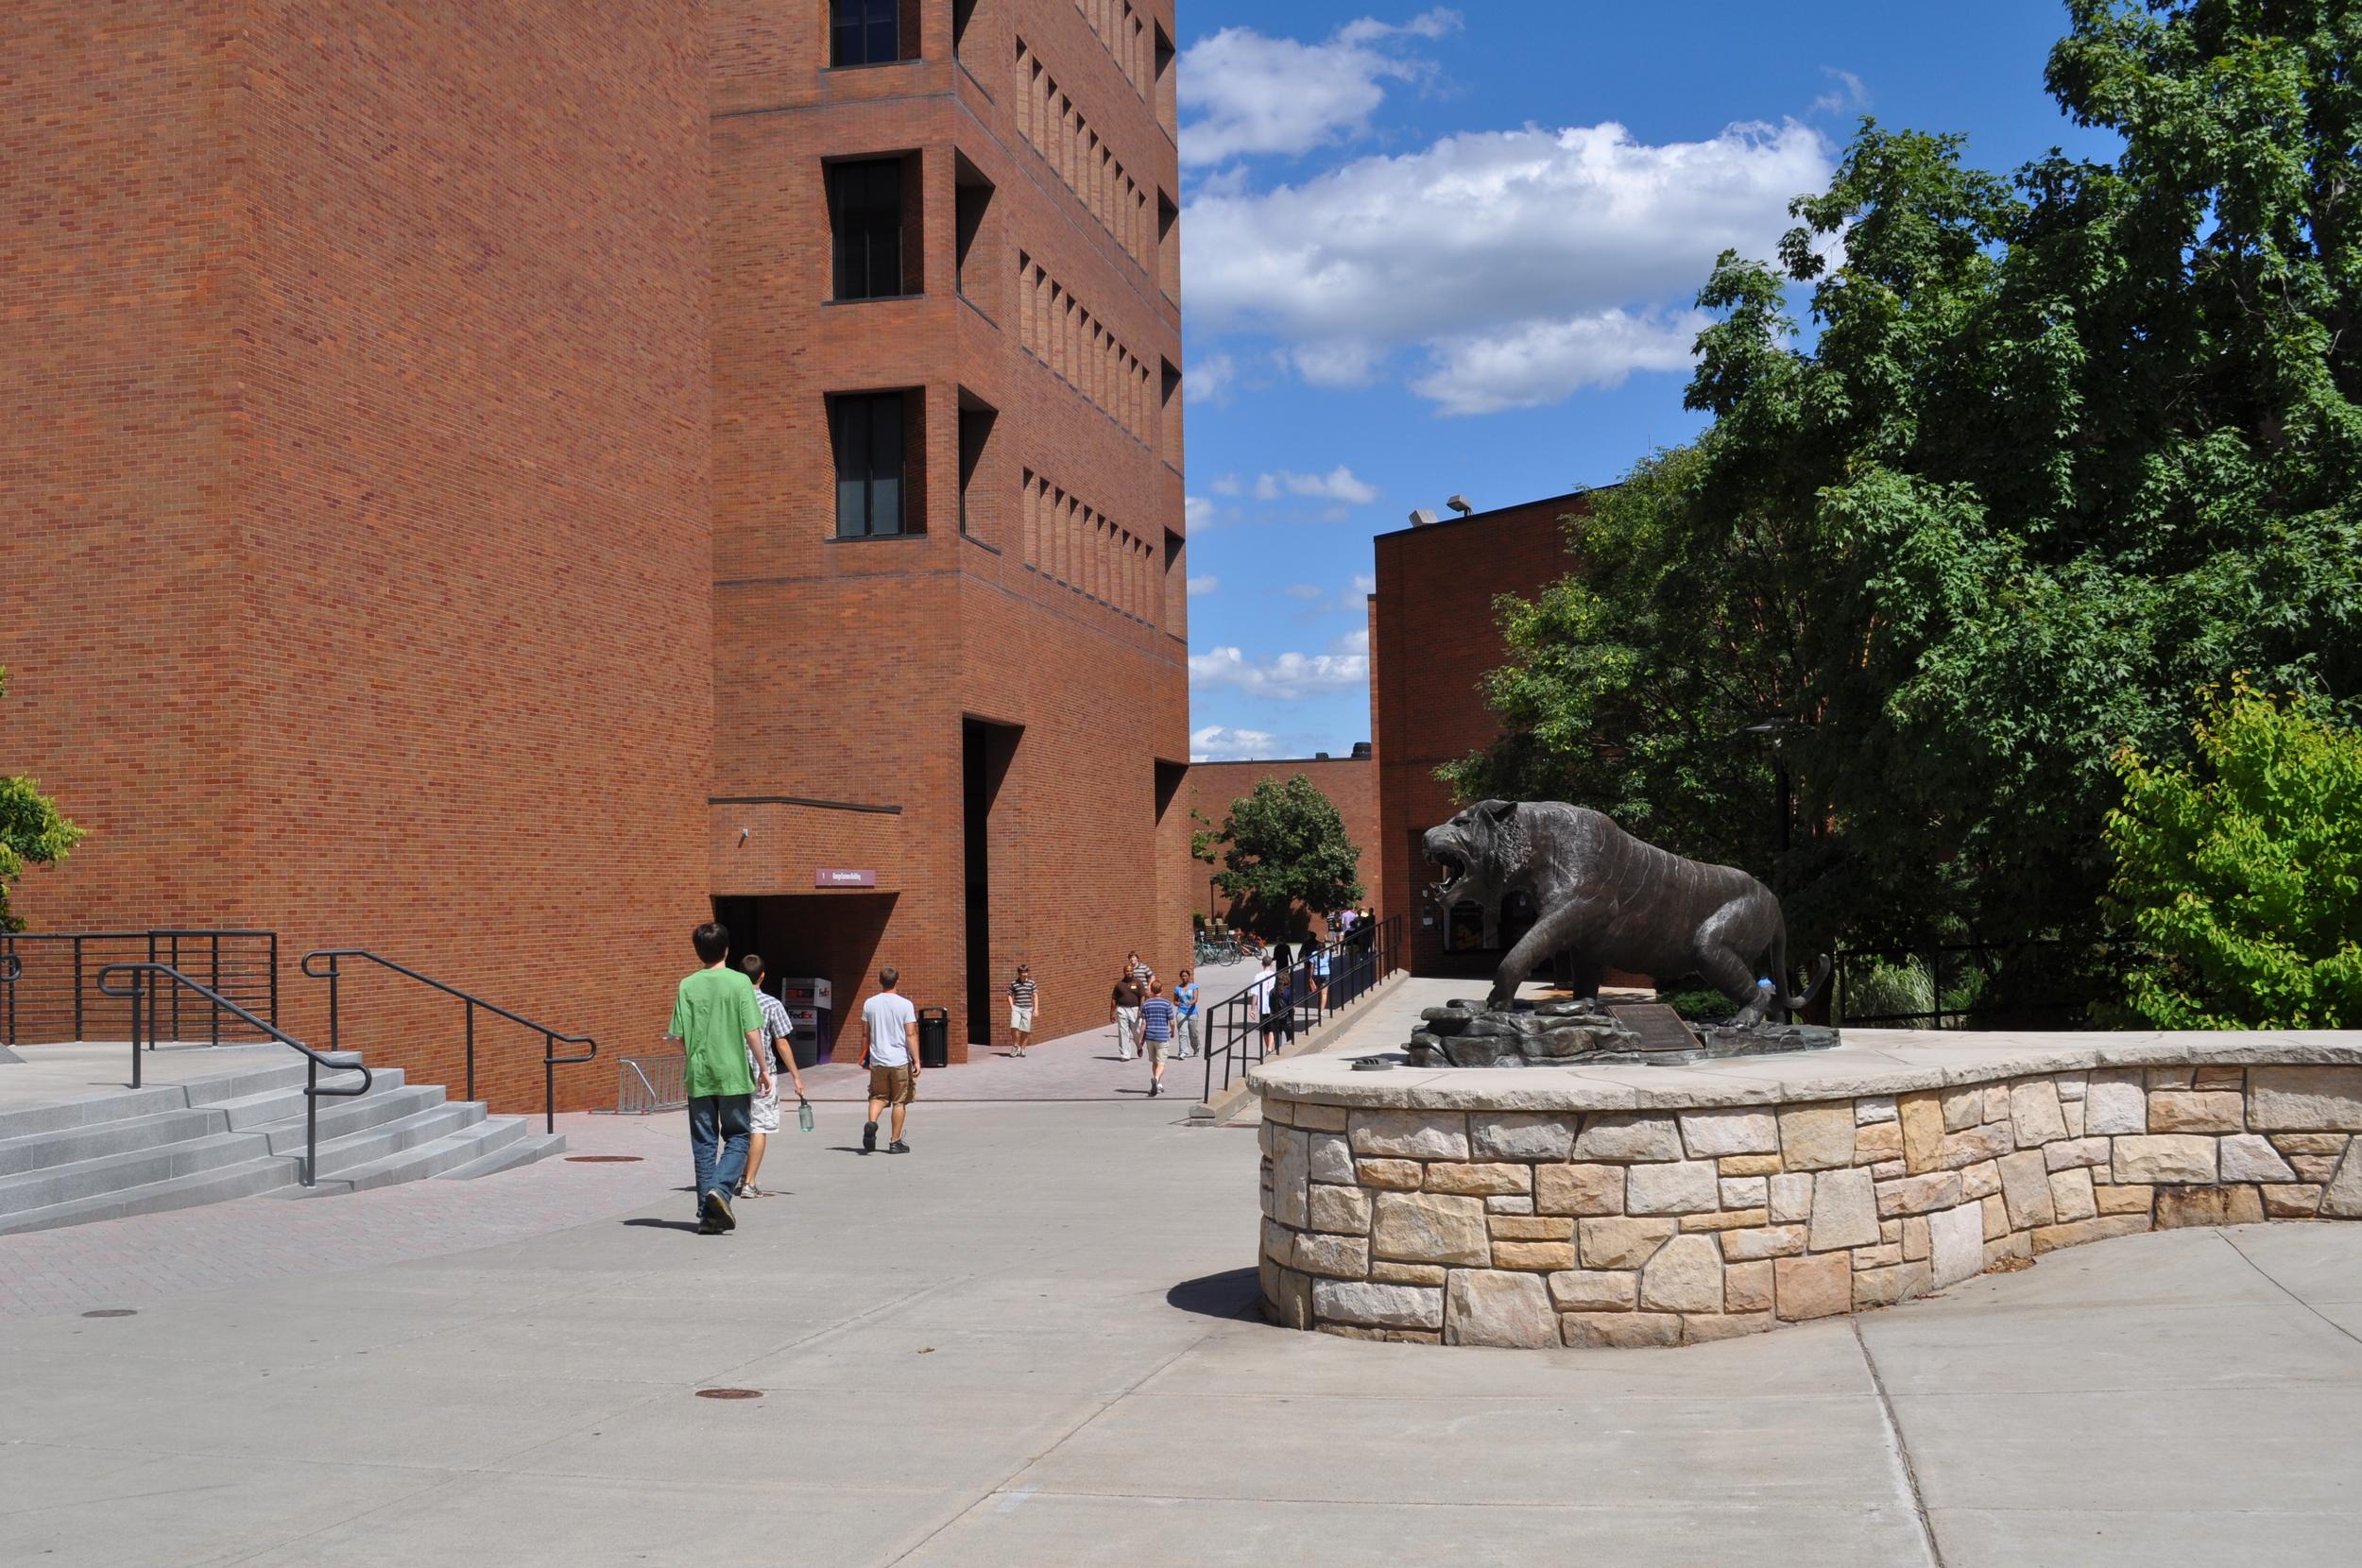 Tiger Courtyard